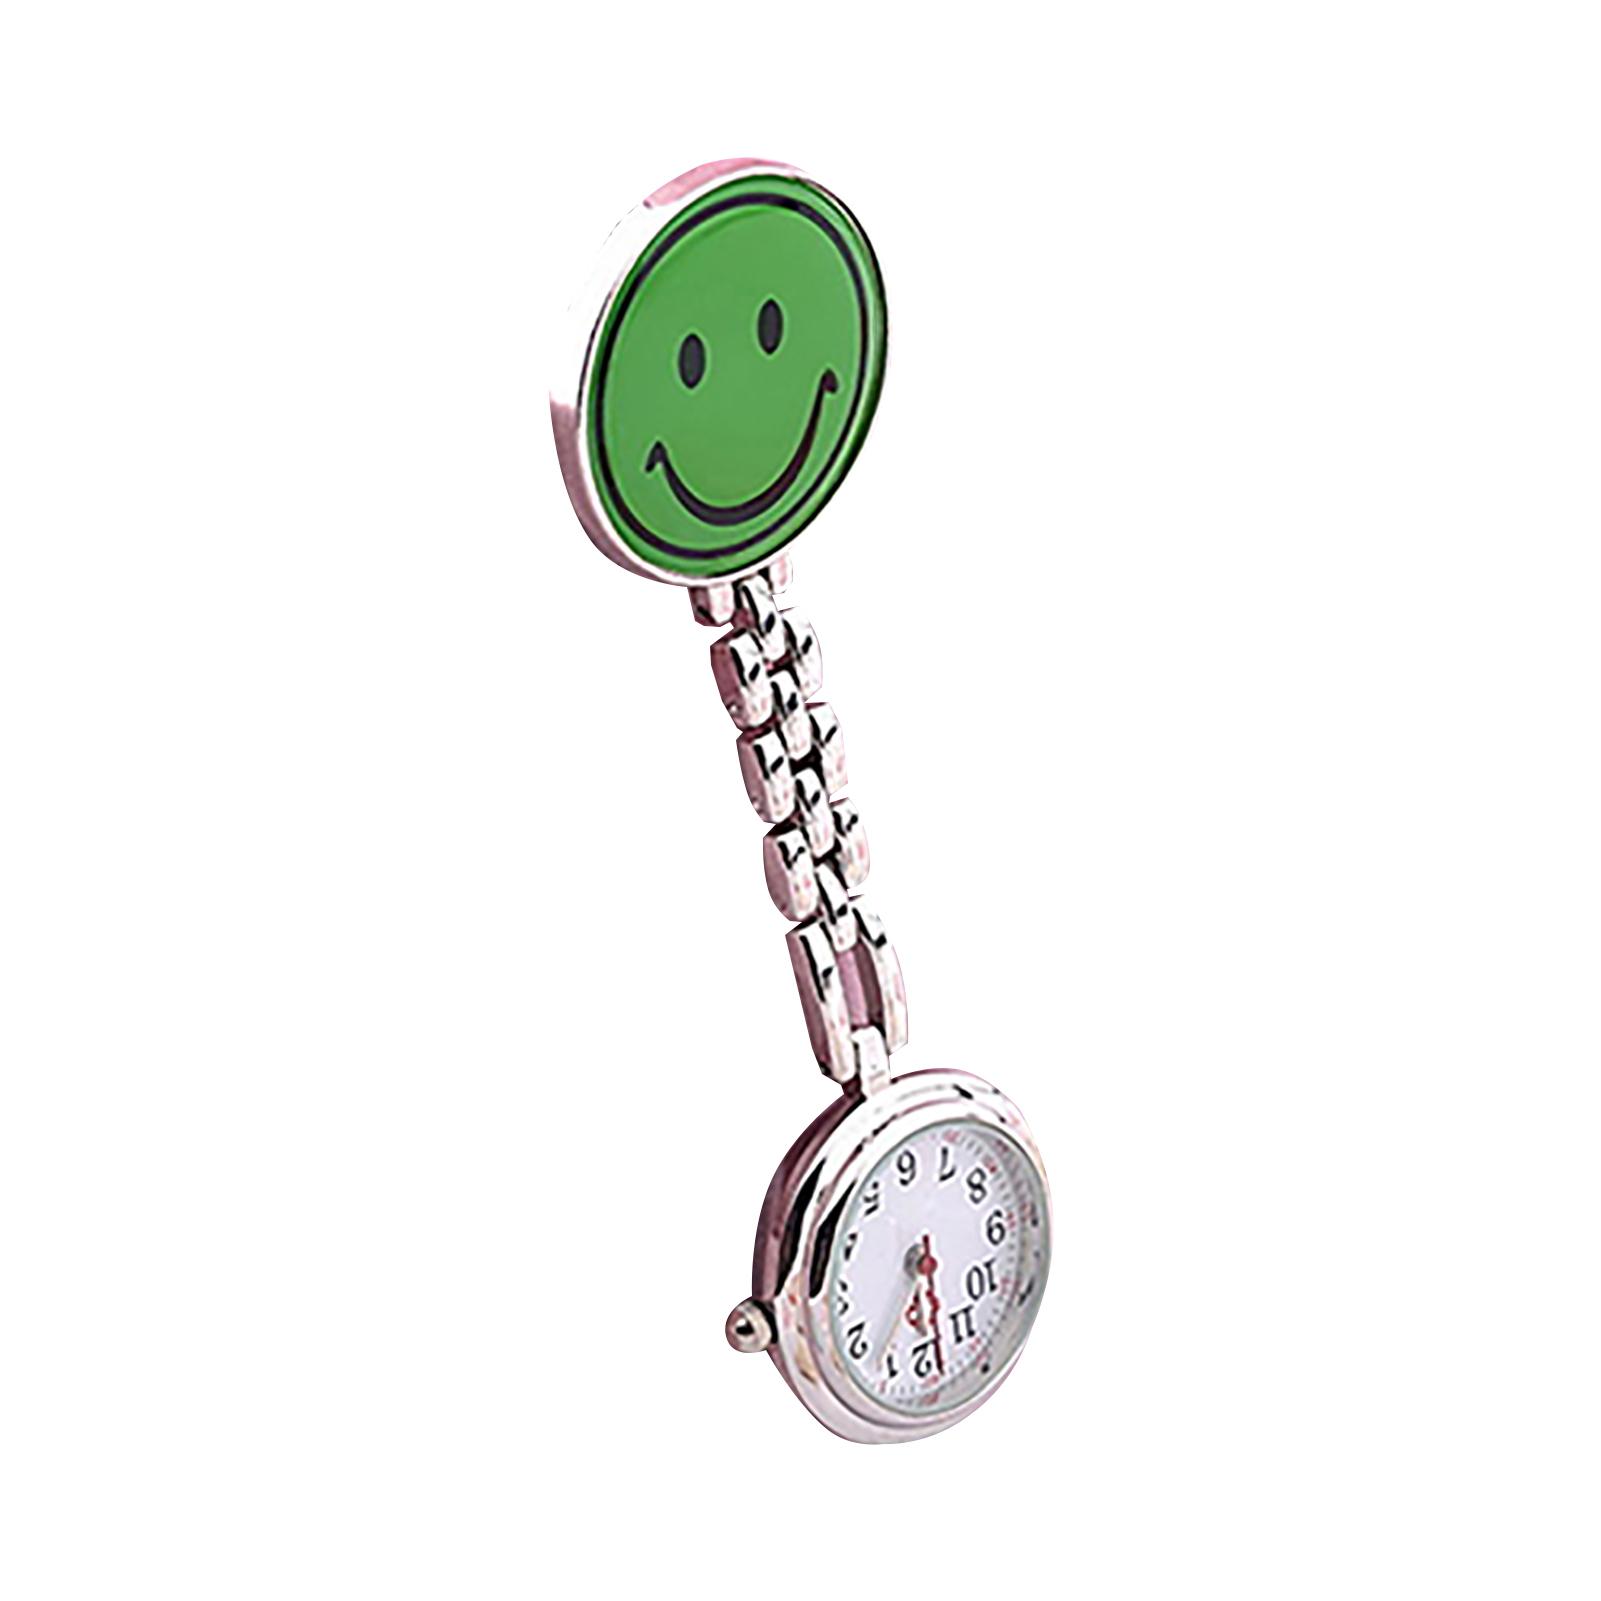 Women-Butterfly-Smile-Face-Analog-Quartz-Clip-On-Brooch-Pocket-Nurse-Watch-Hot thumbnail 17